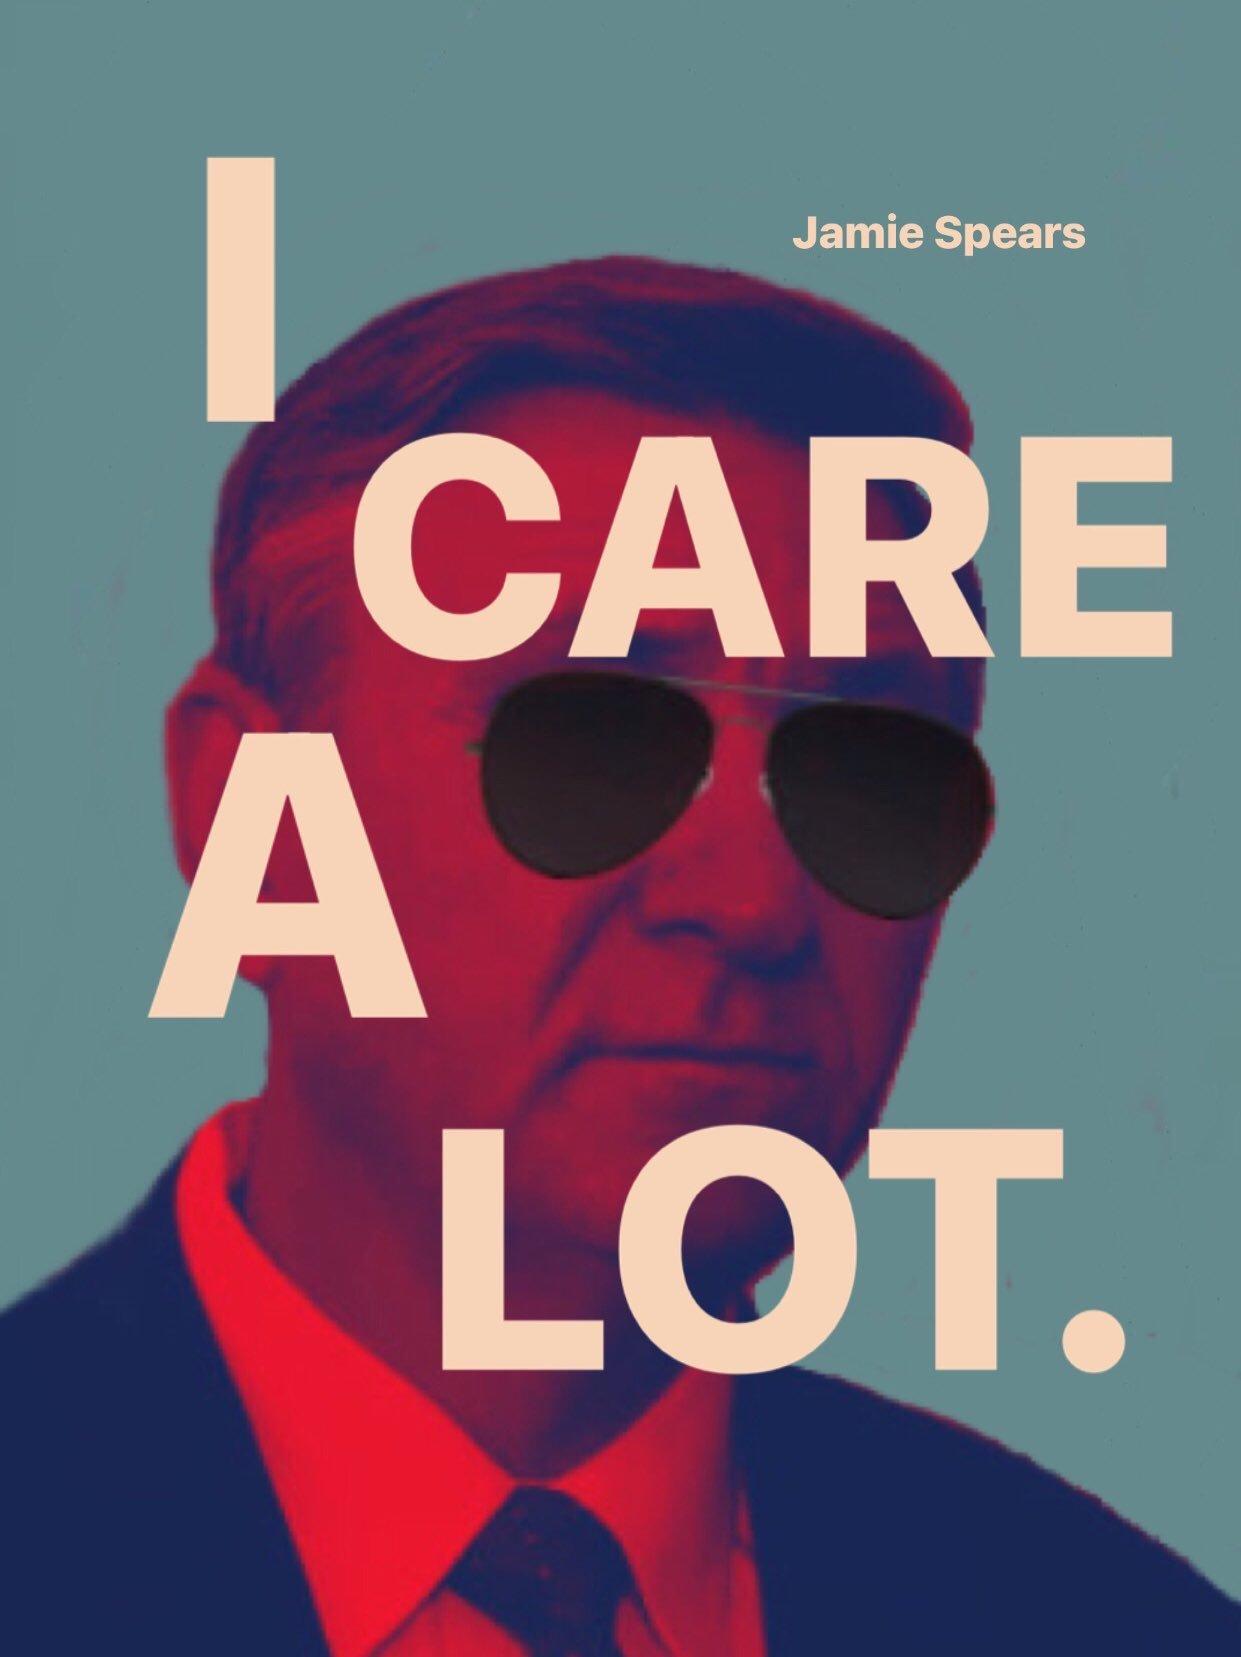 I care a lot Jamie Spears meme